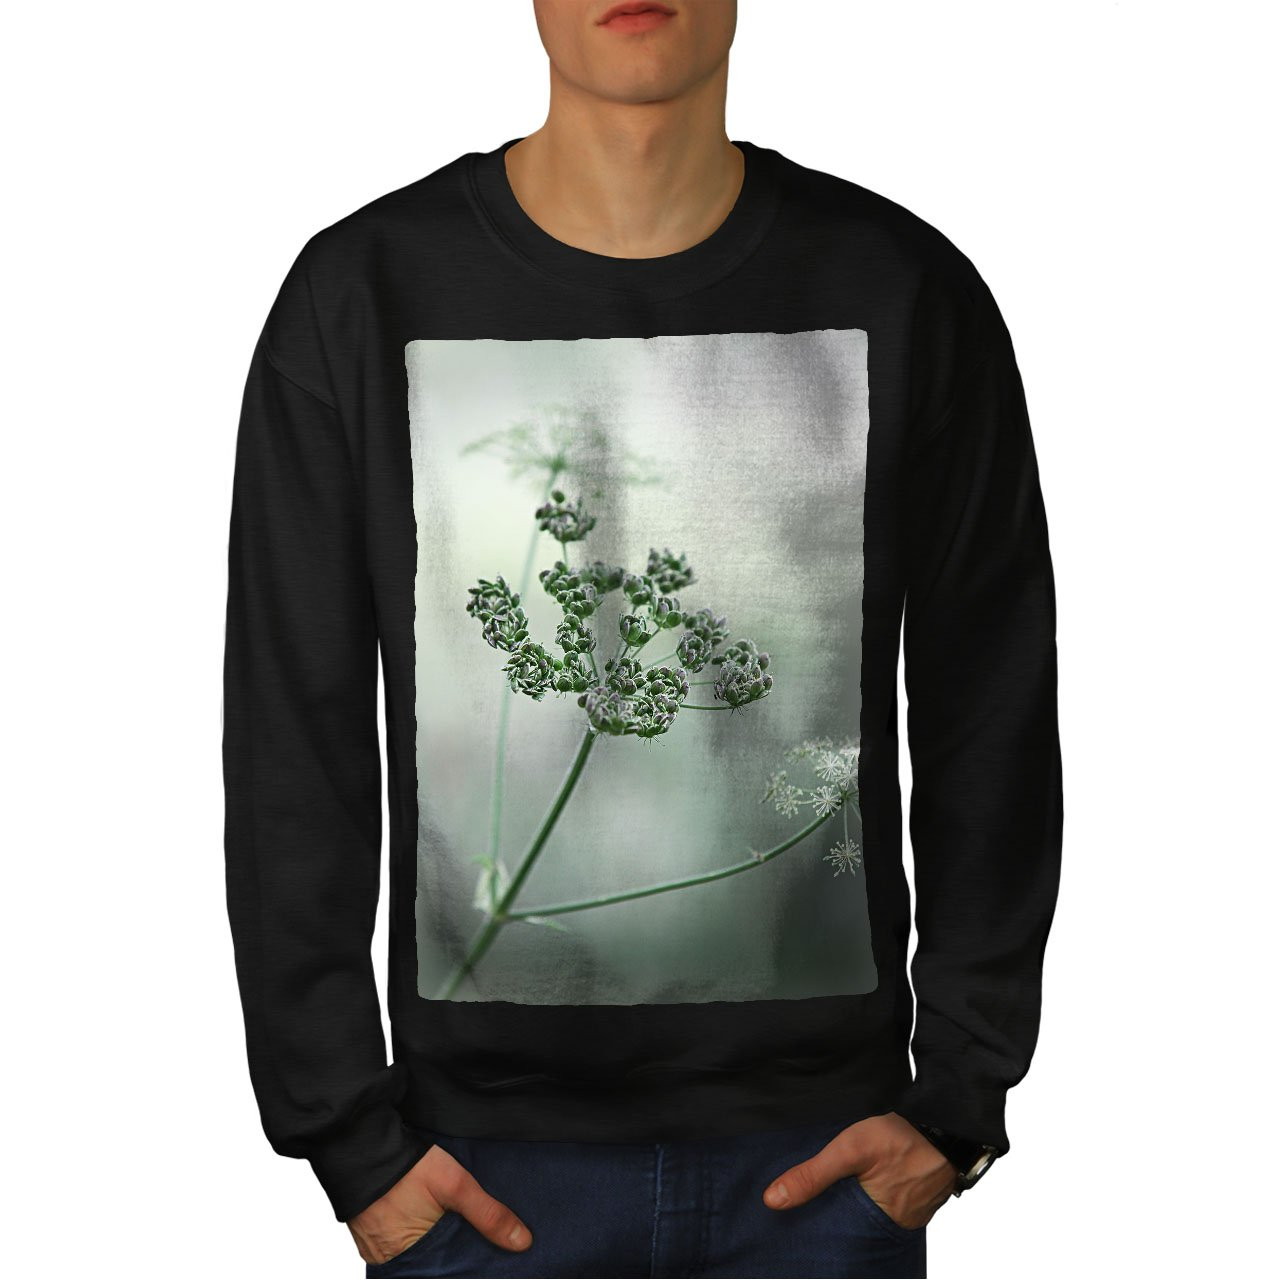 wellcoda Flower Plant Photo Mens Sweatshirt Wildlife Casual Jumper